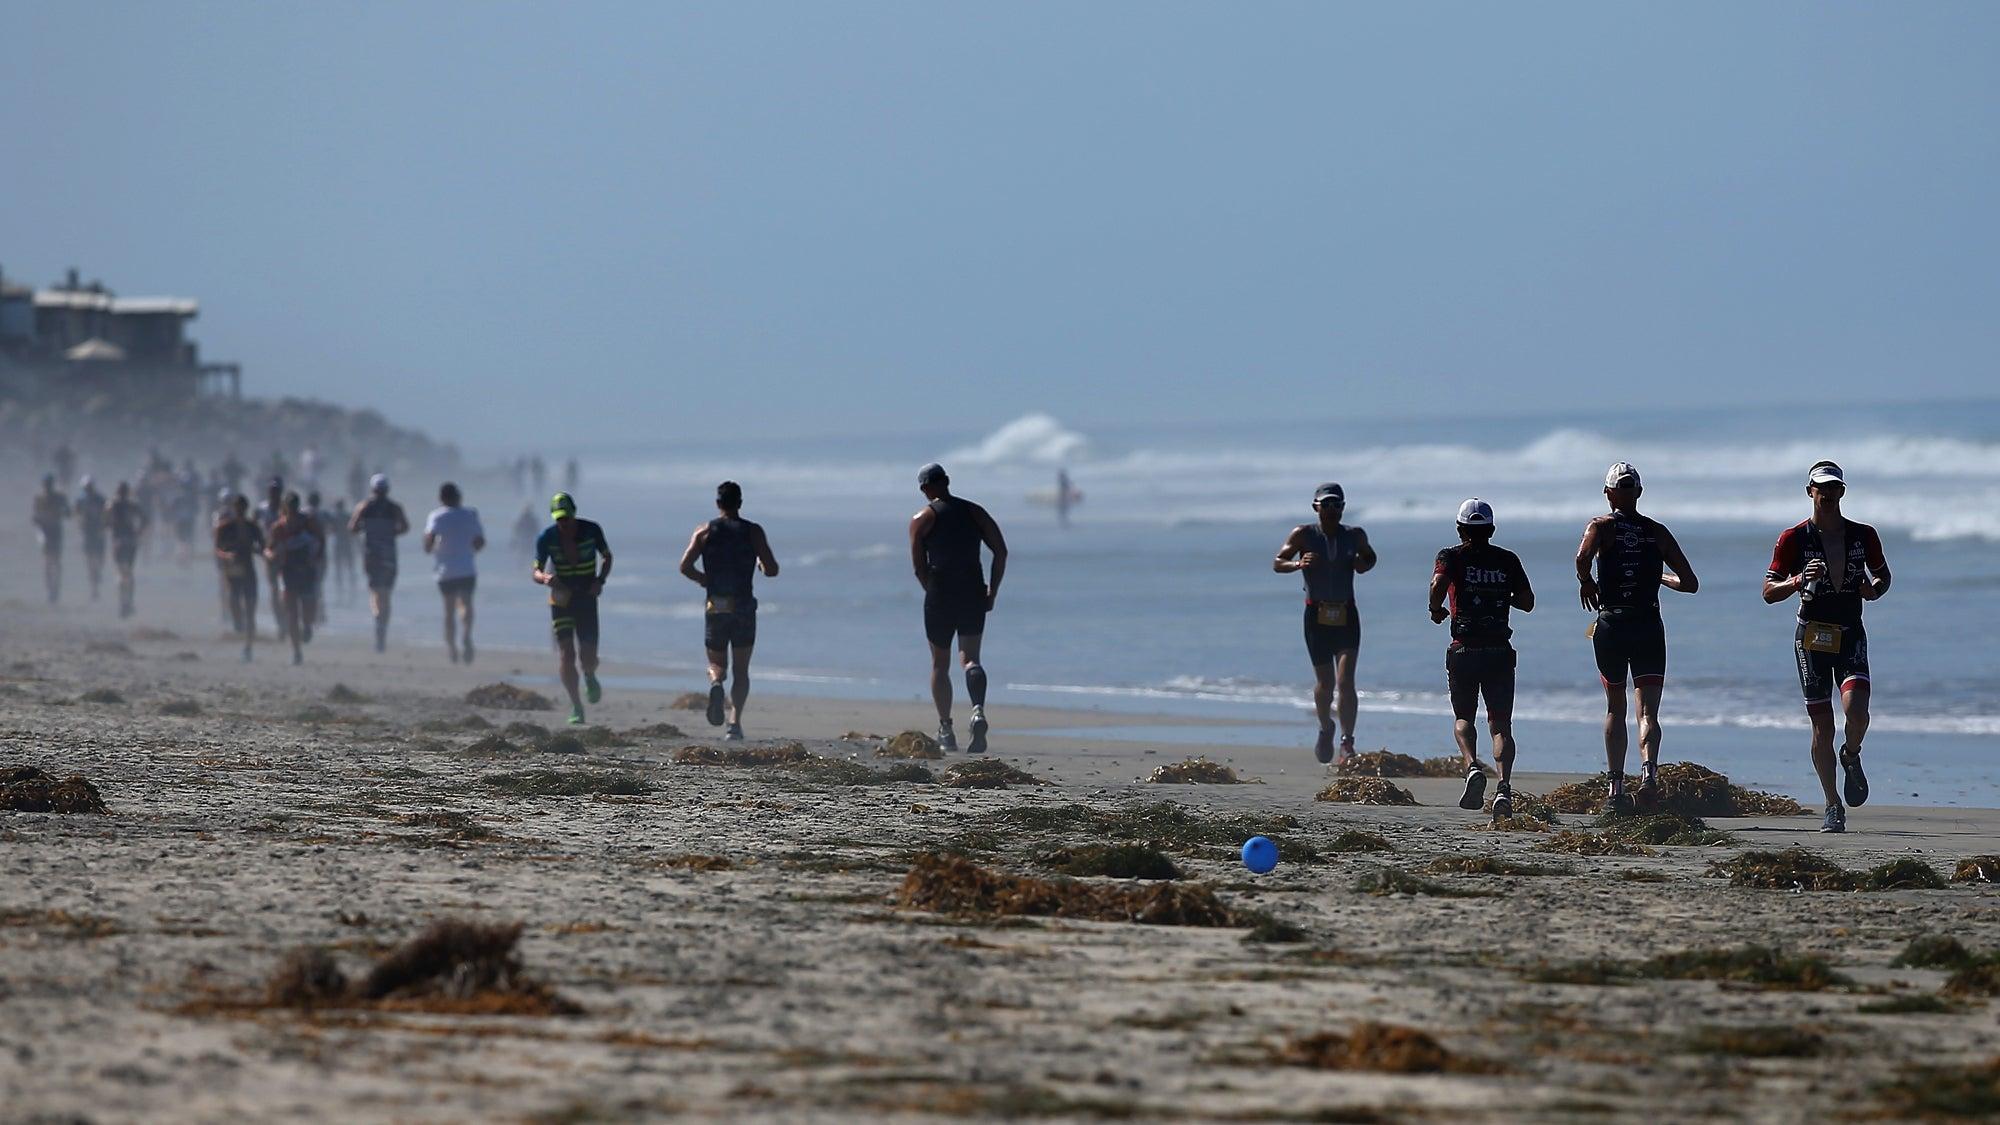 fall half-iron-distance triathlons